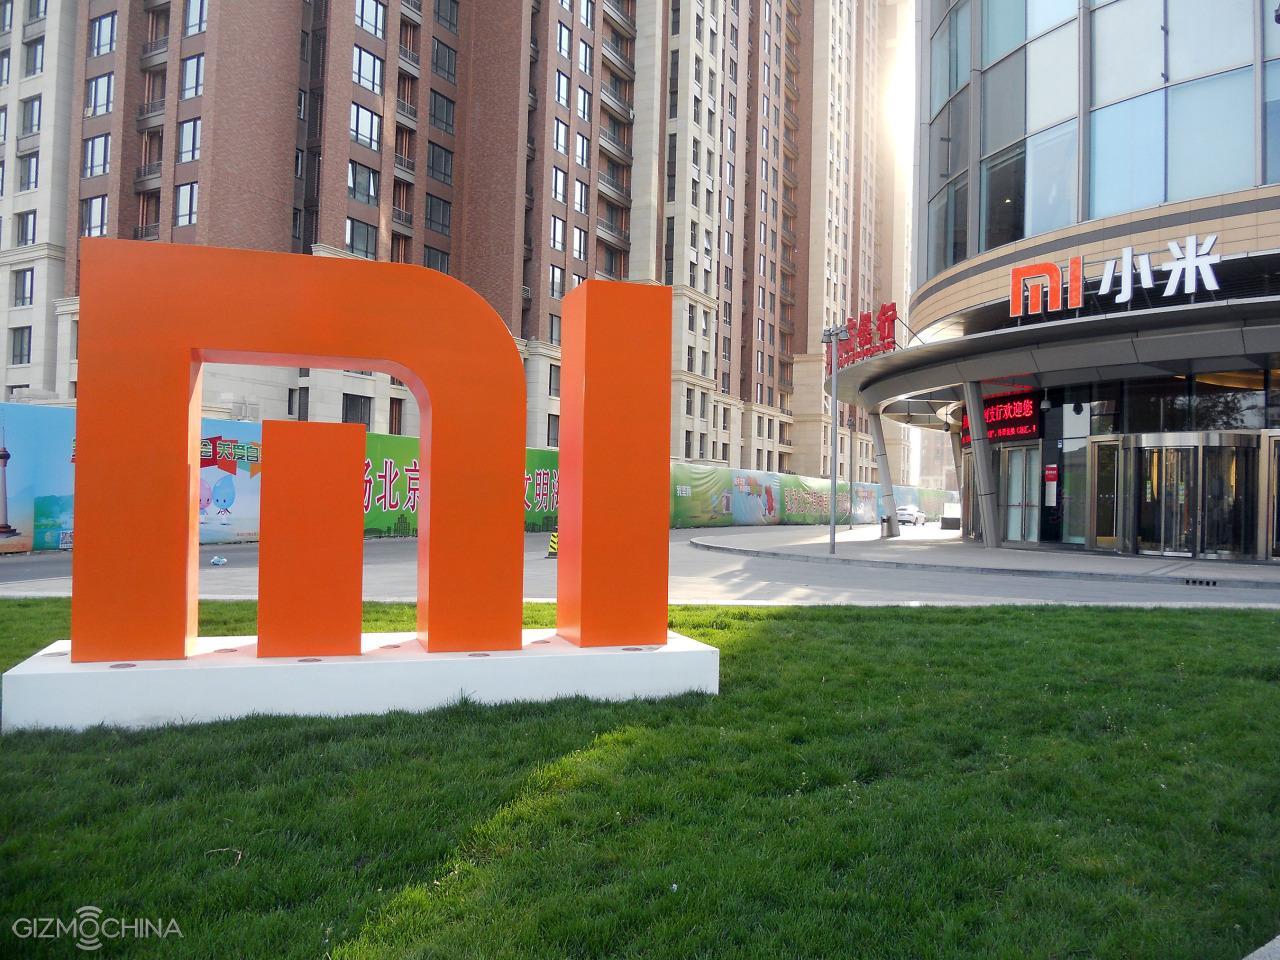 Xiaomi возглавила рынок смартфонов Android 5G во втором квартале 2021 года